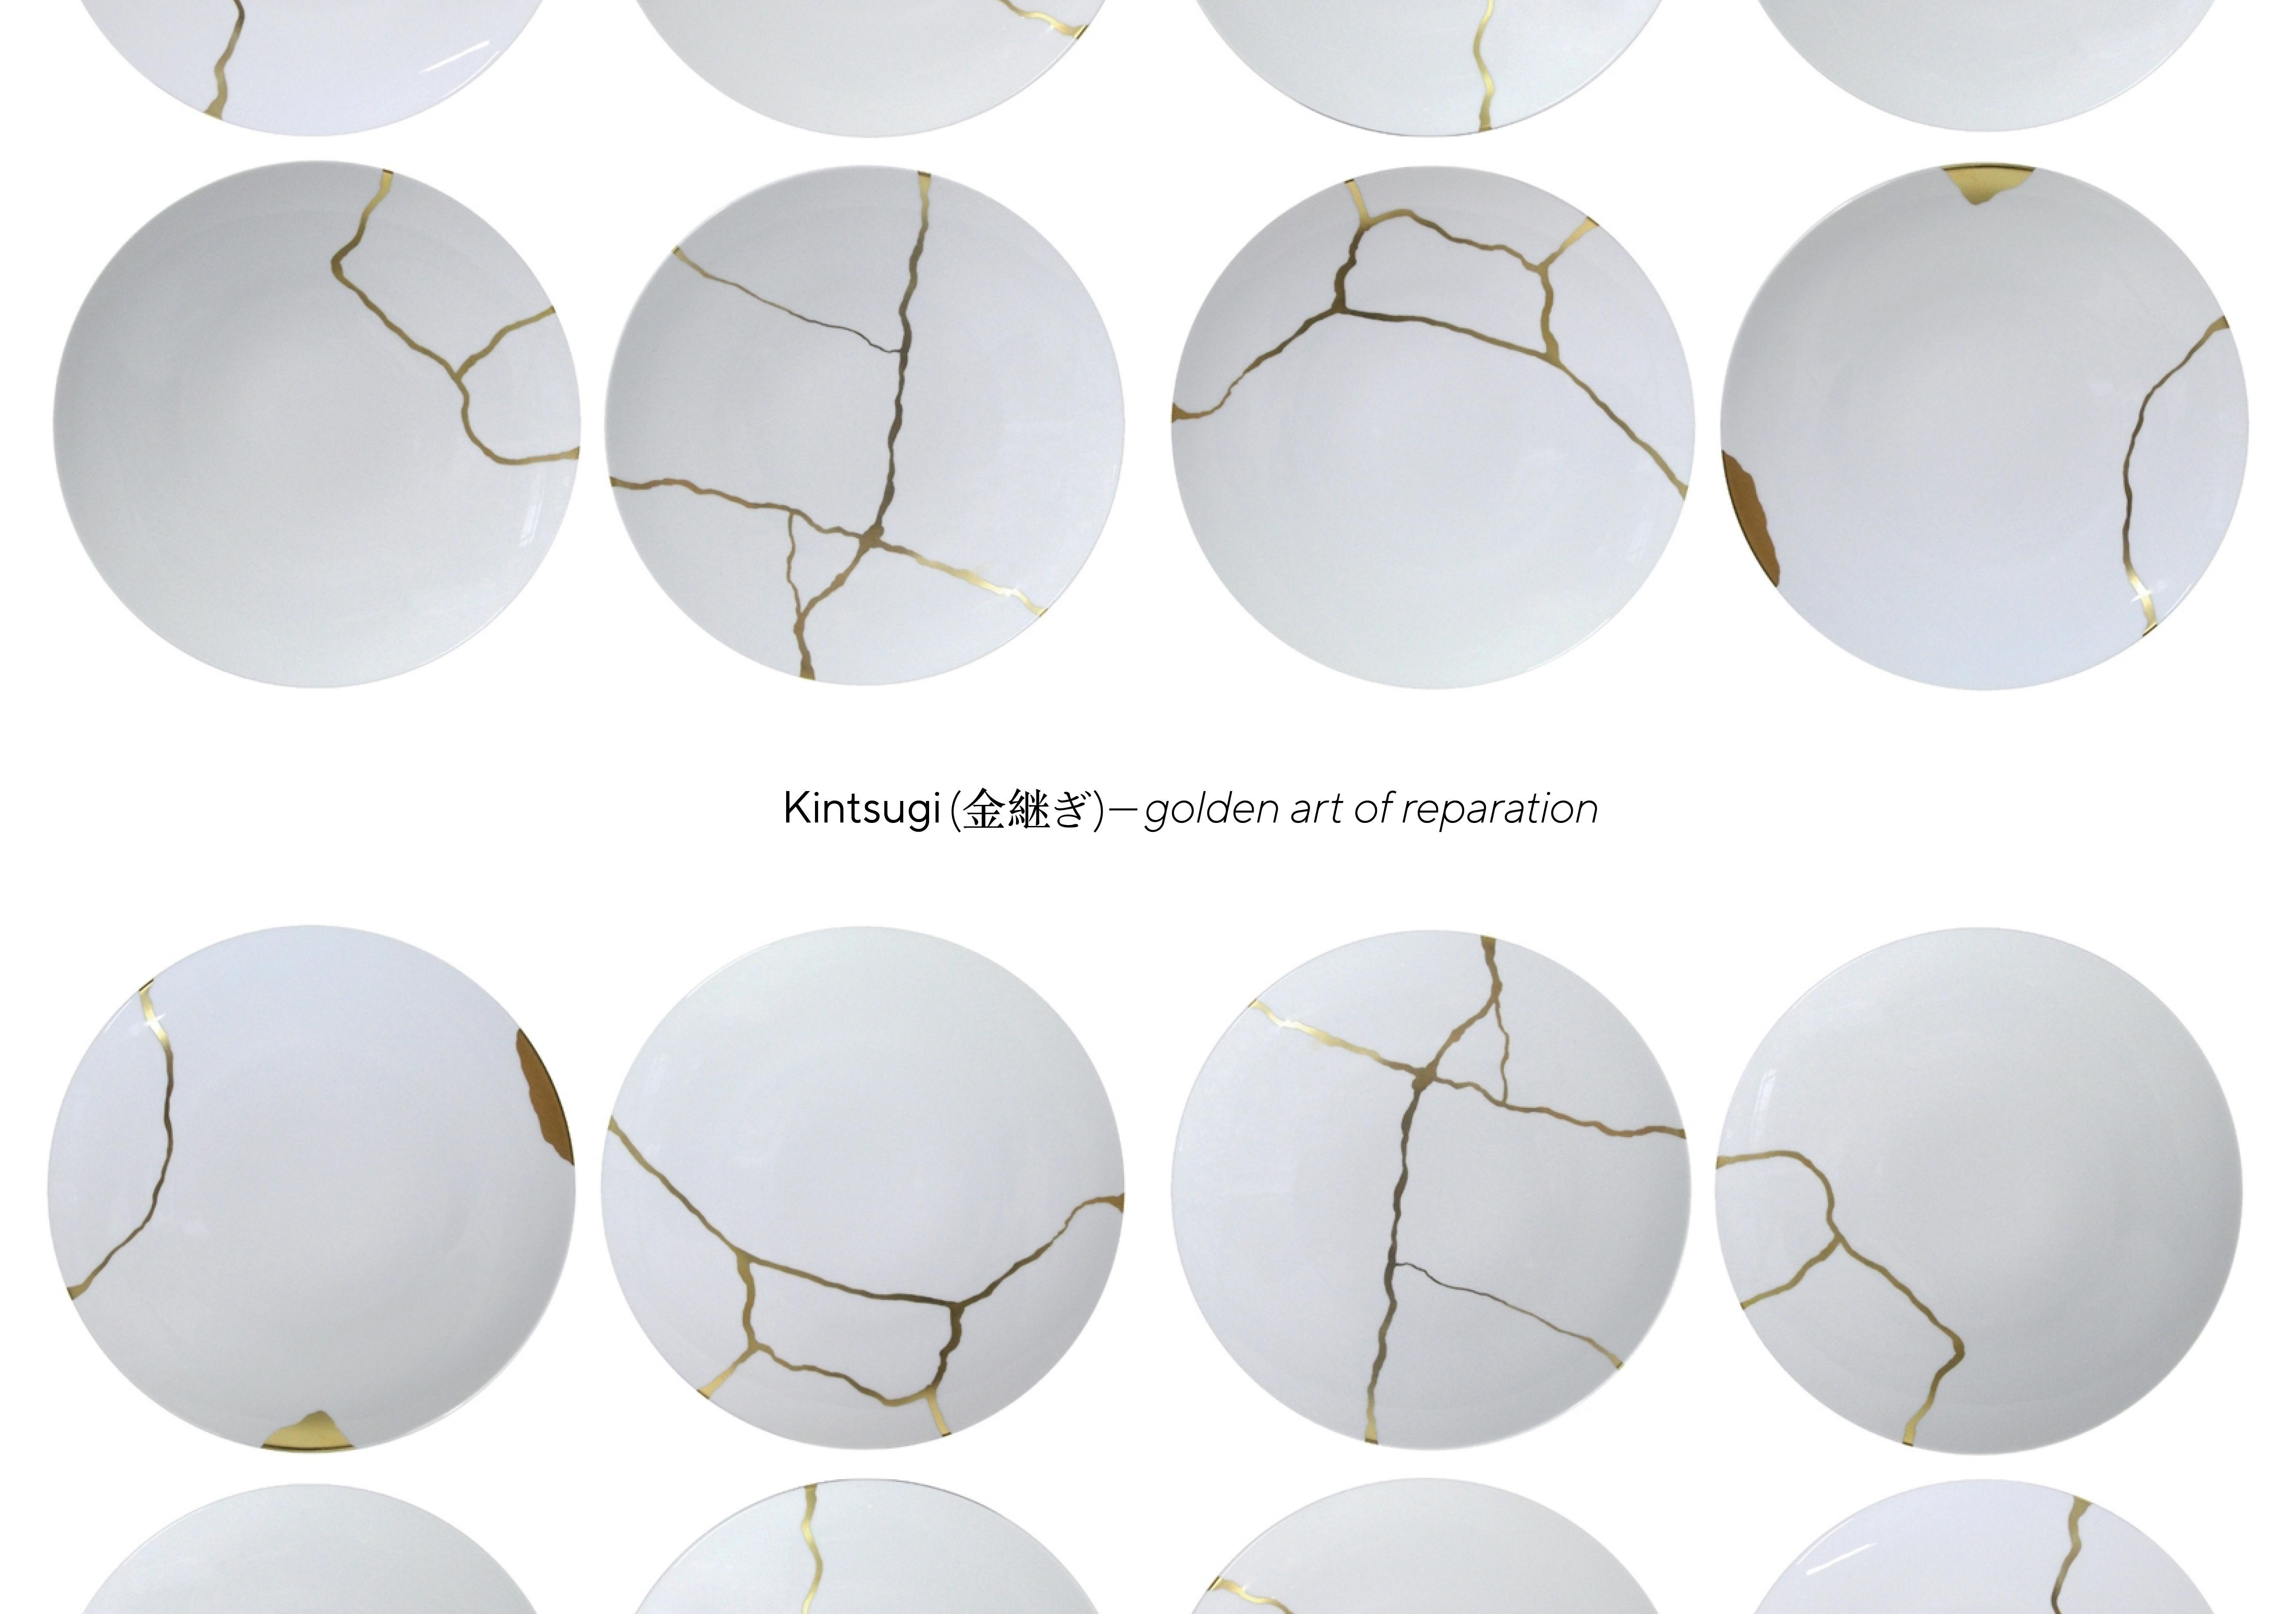 The Collection of Kintsugi Pottery Marumado Packaging Design by Mariia Pavlova